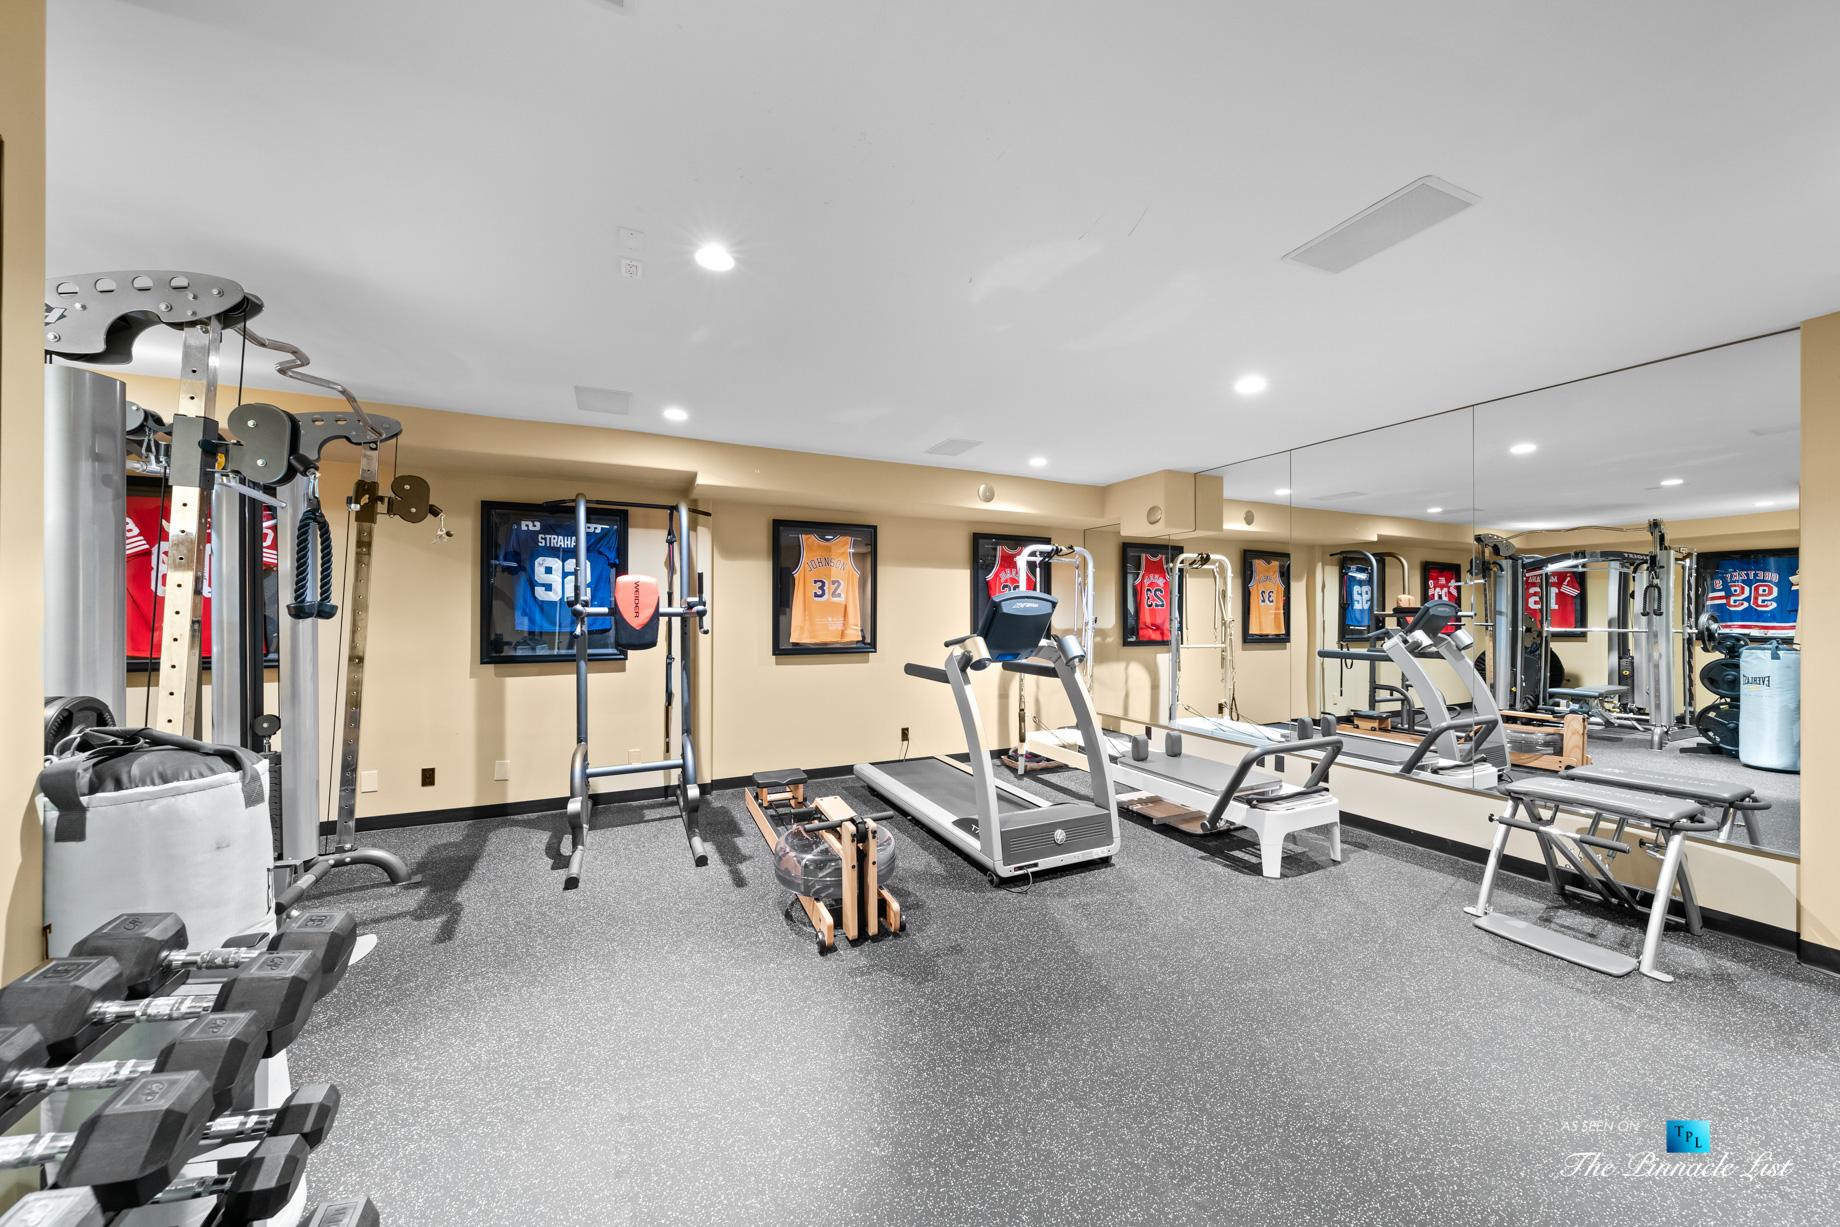 216 7th St, Manhattan Beach, CA, USA – Luxury Real Estate – Coastal Villa Home – Basement Gym